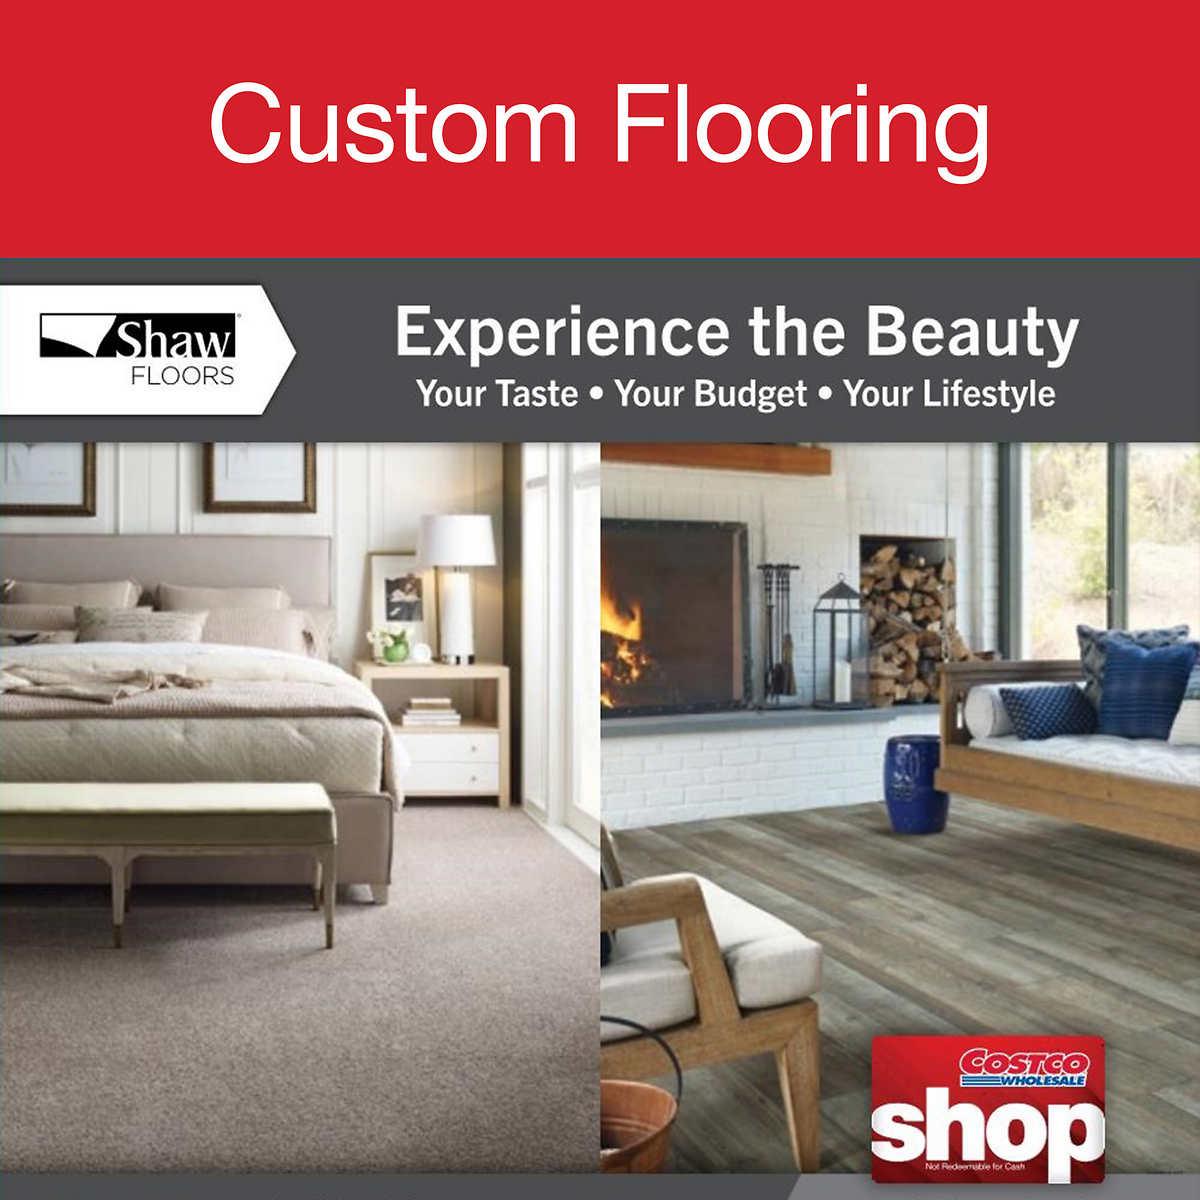 Shaw Carpet, Hardwood & Laminate Flooring - Flooring & Tile Costco